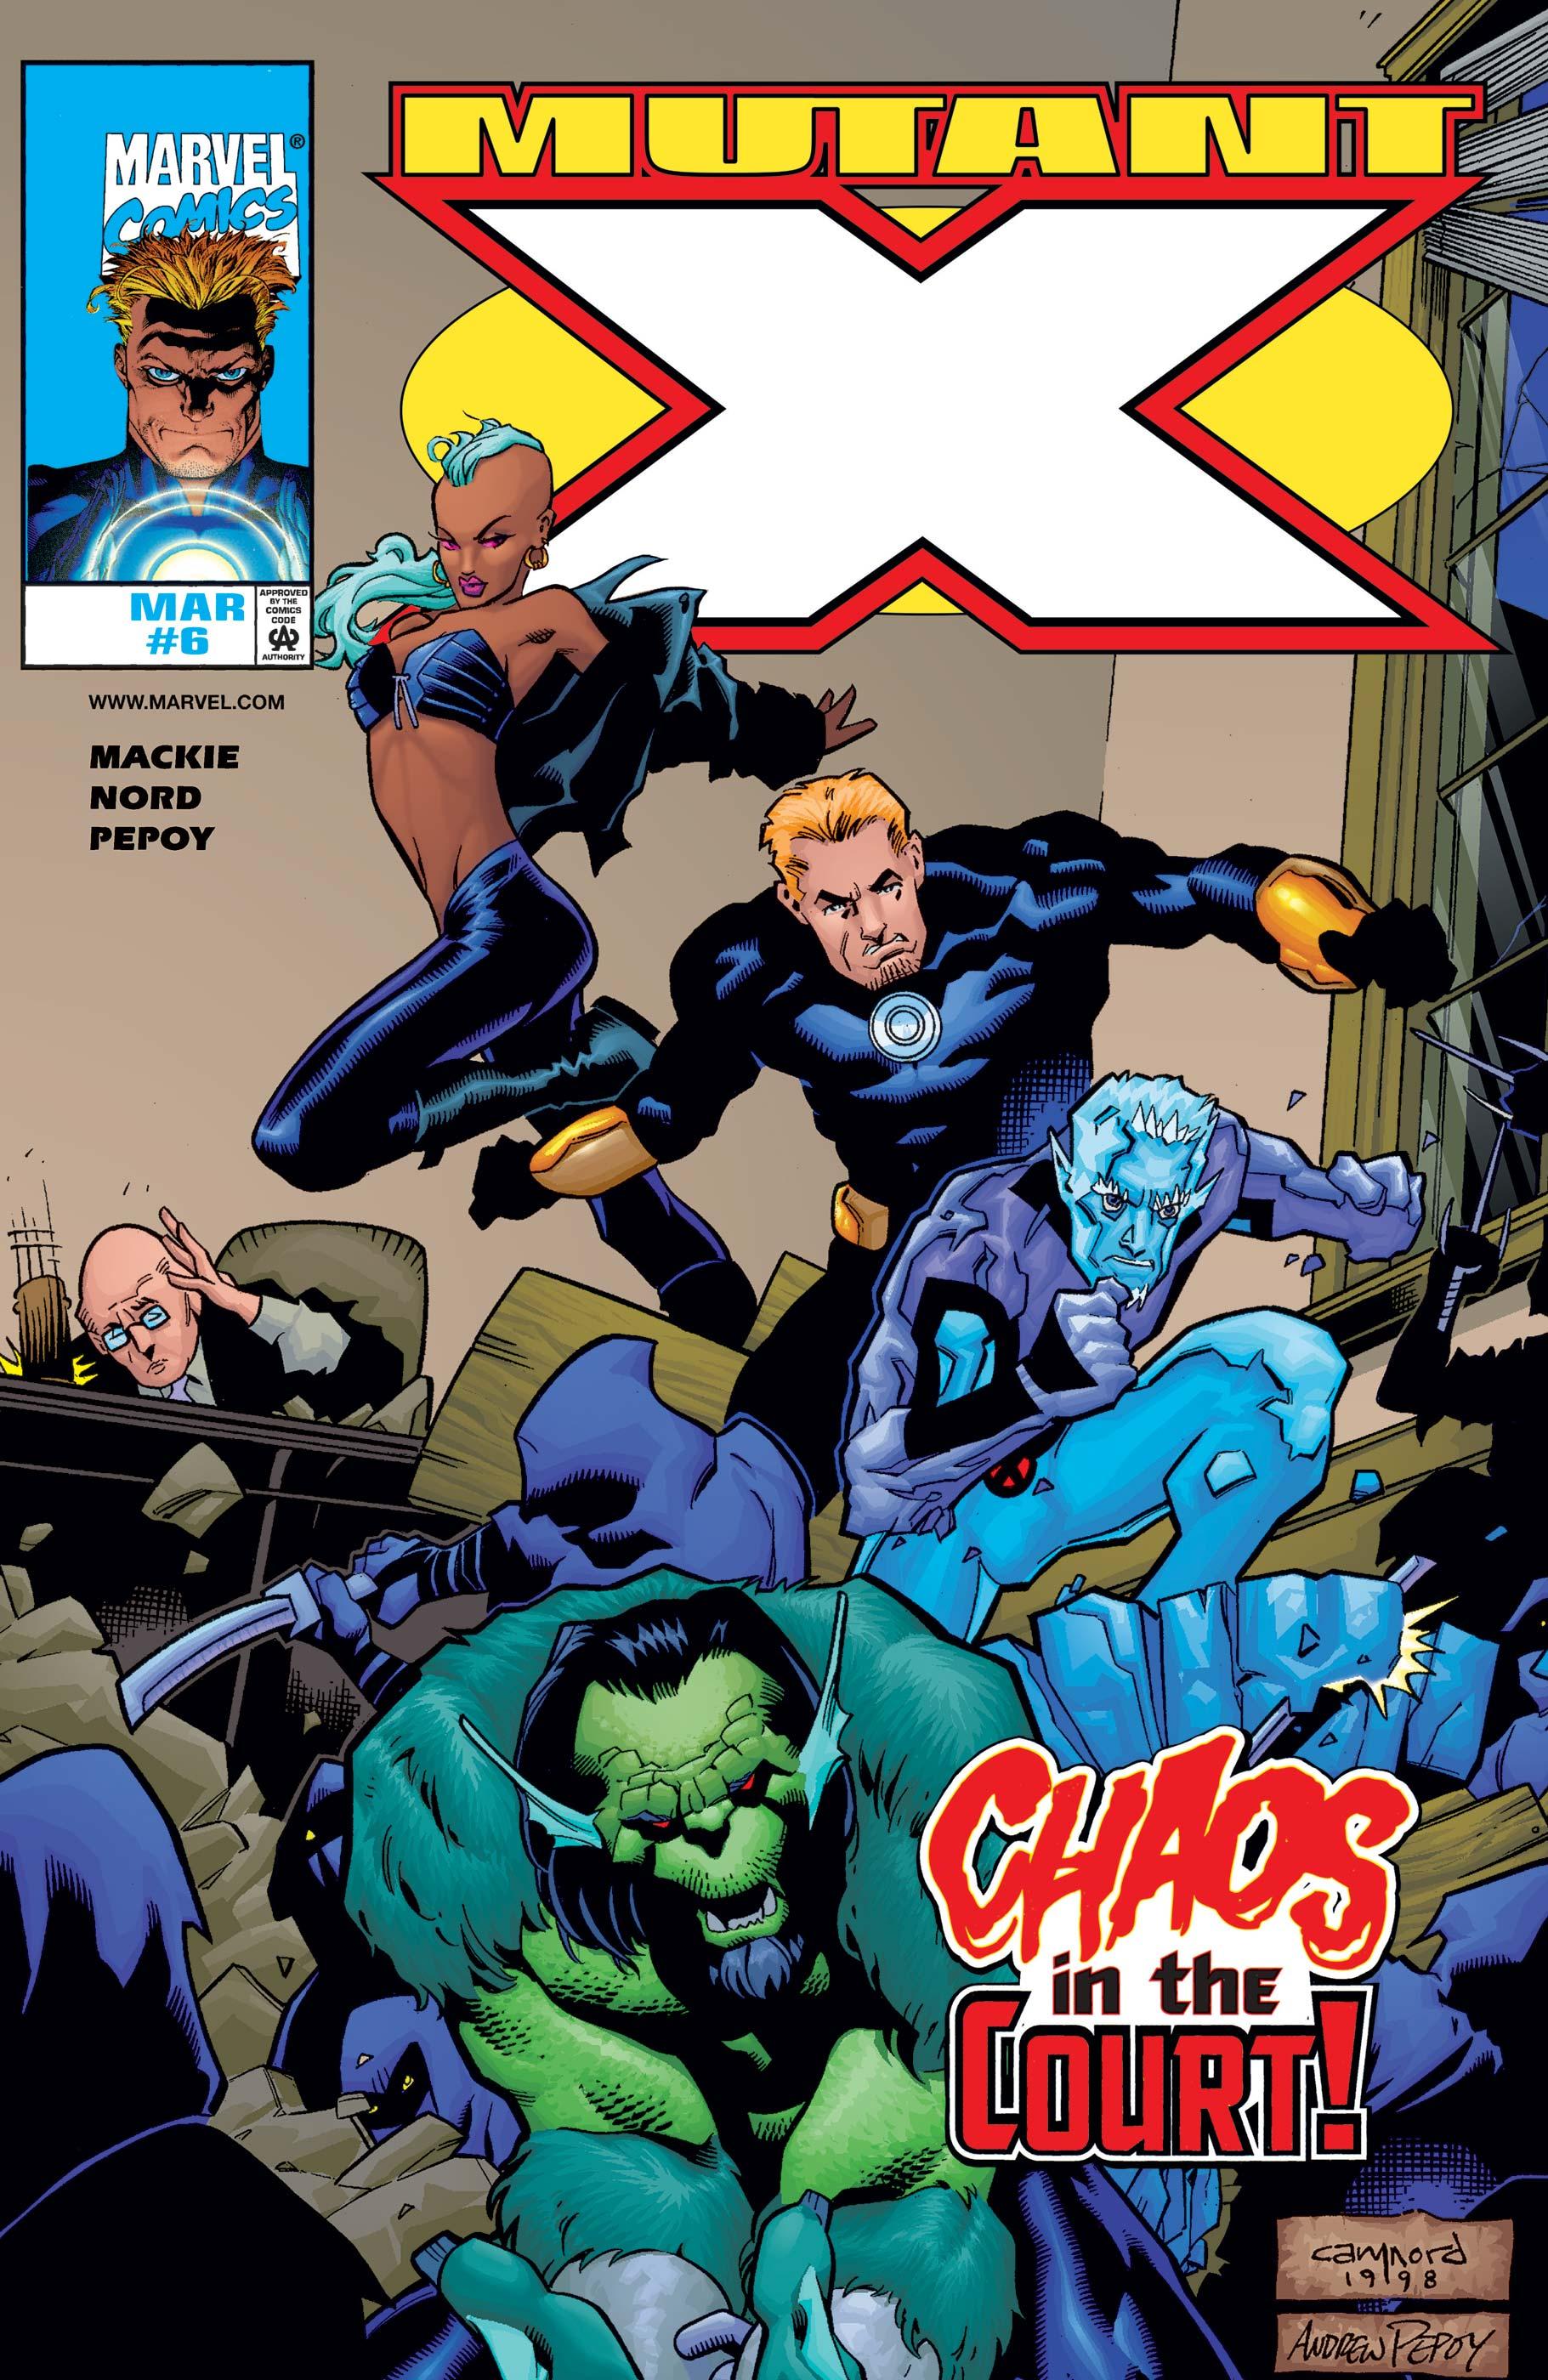 Mutant X (1998) #6